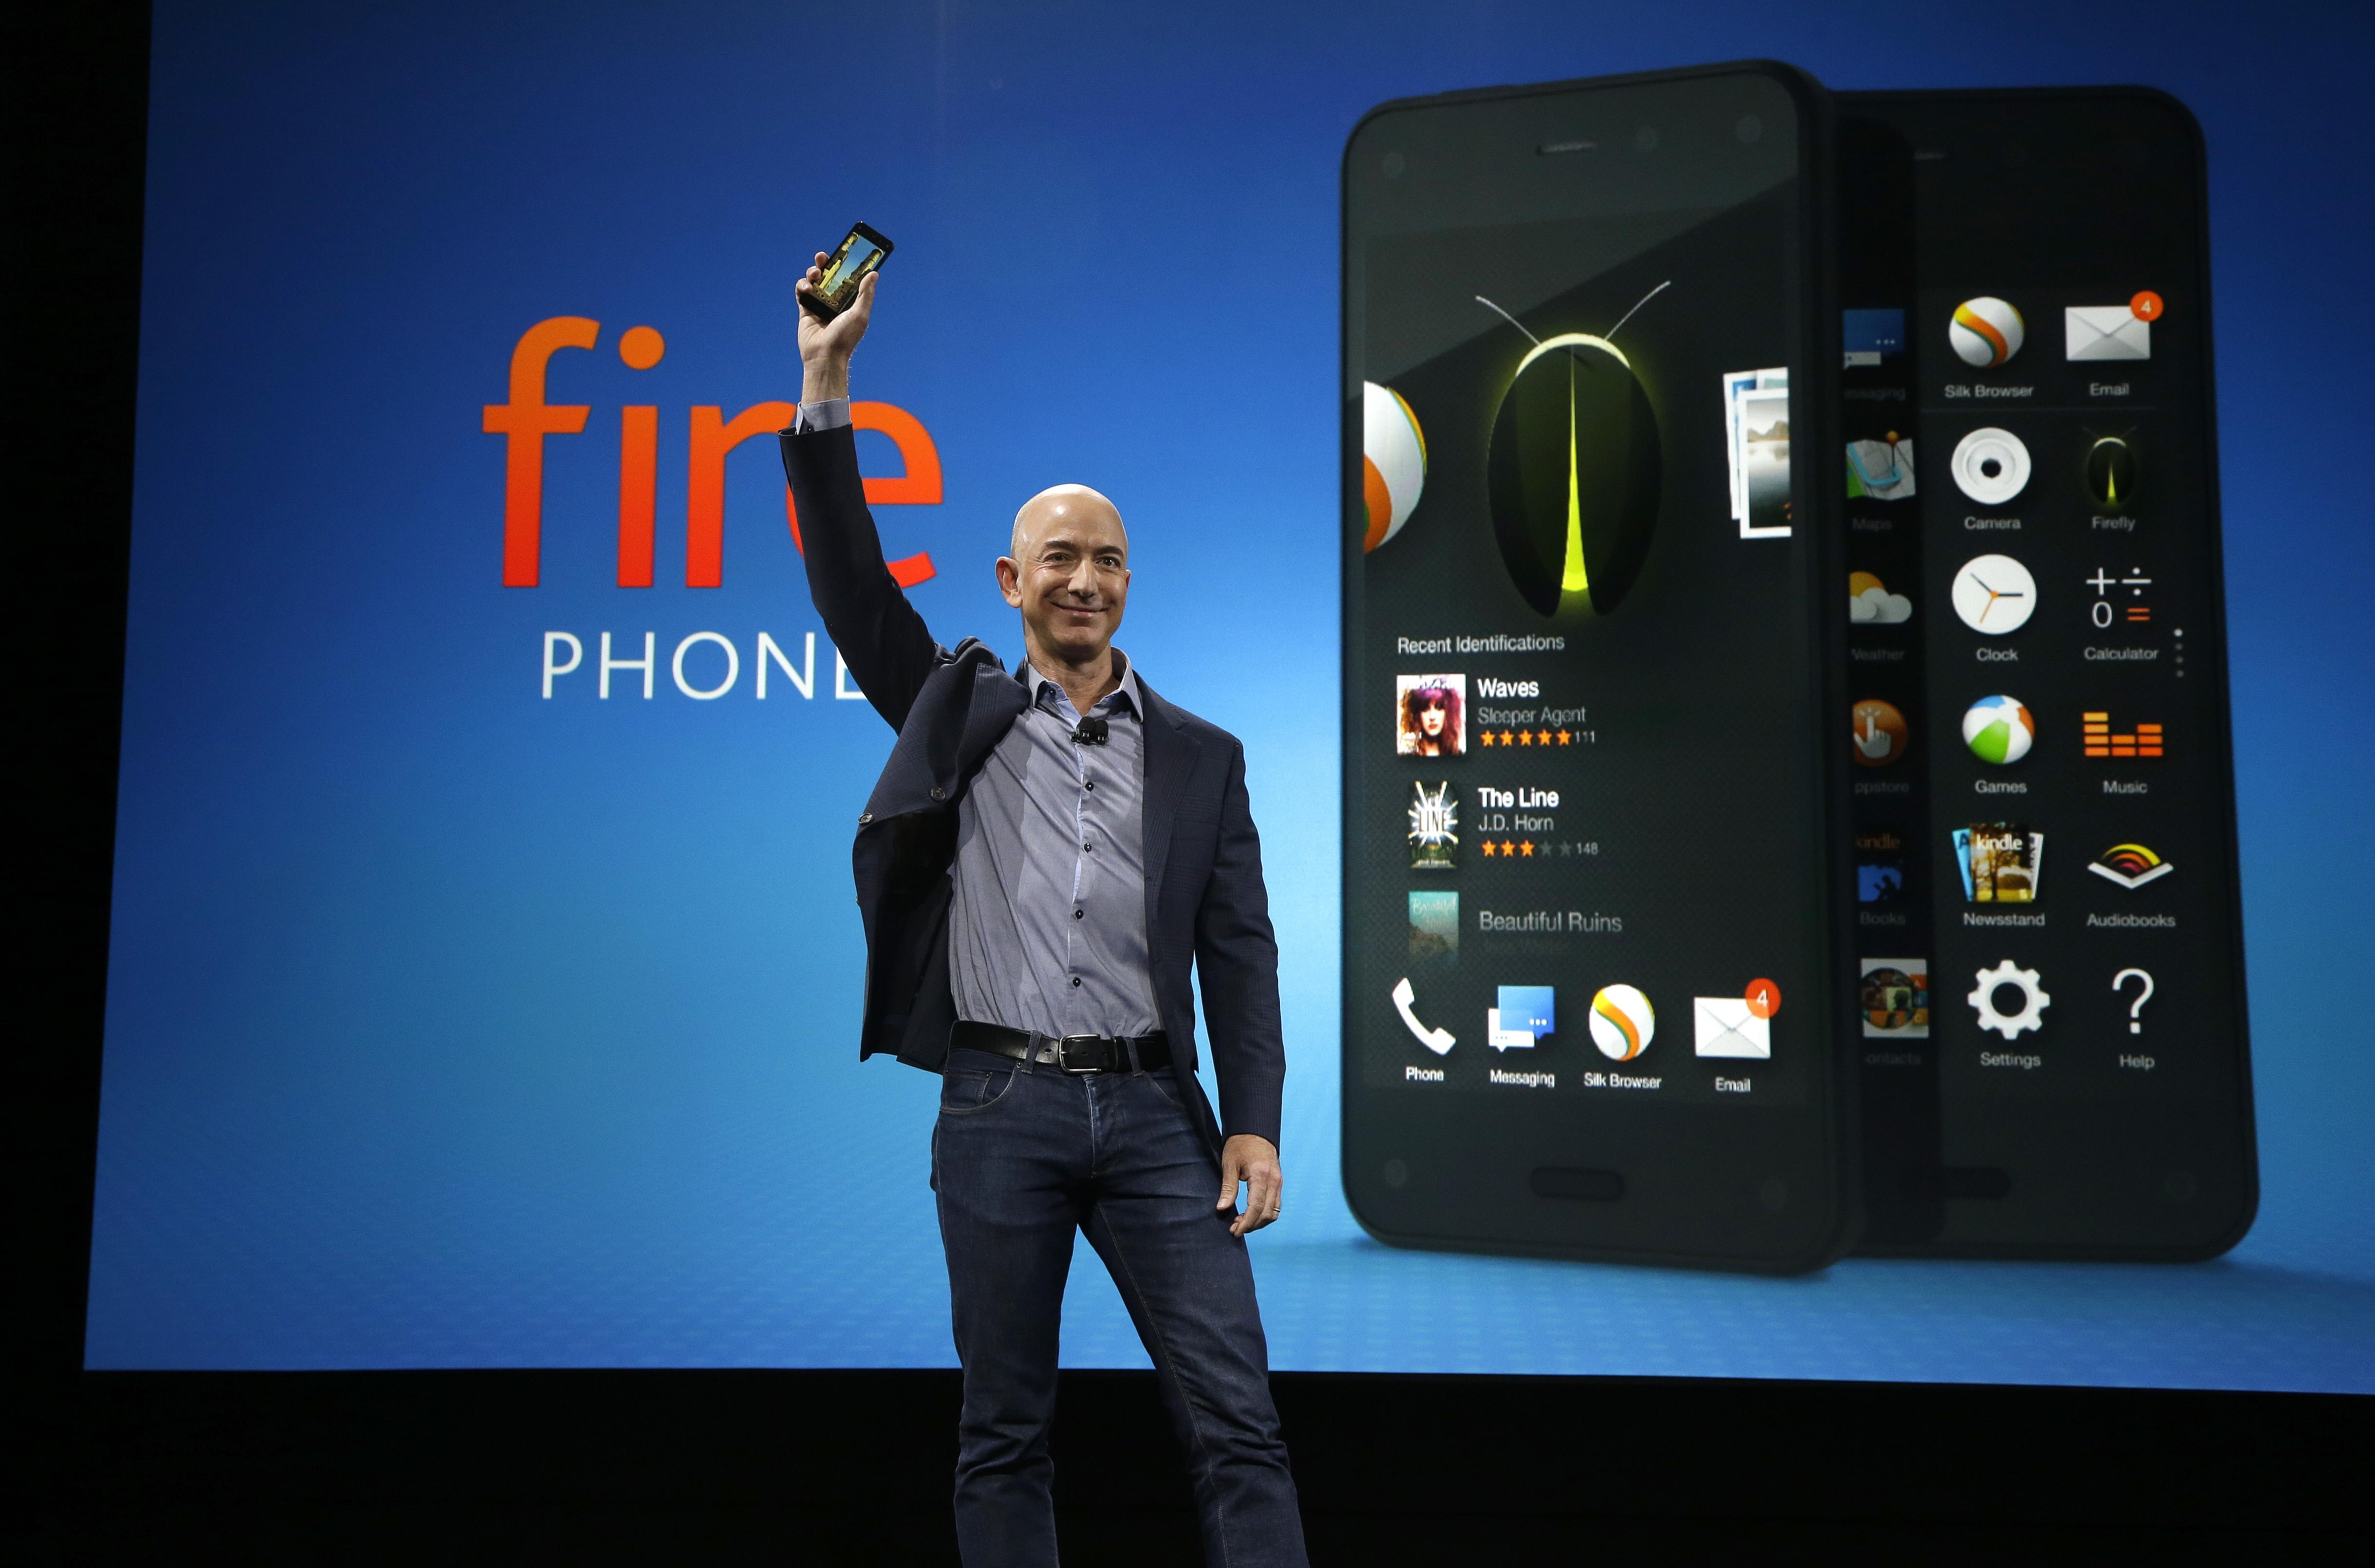 amazon, jeff bezos, fire phone